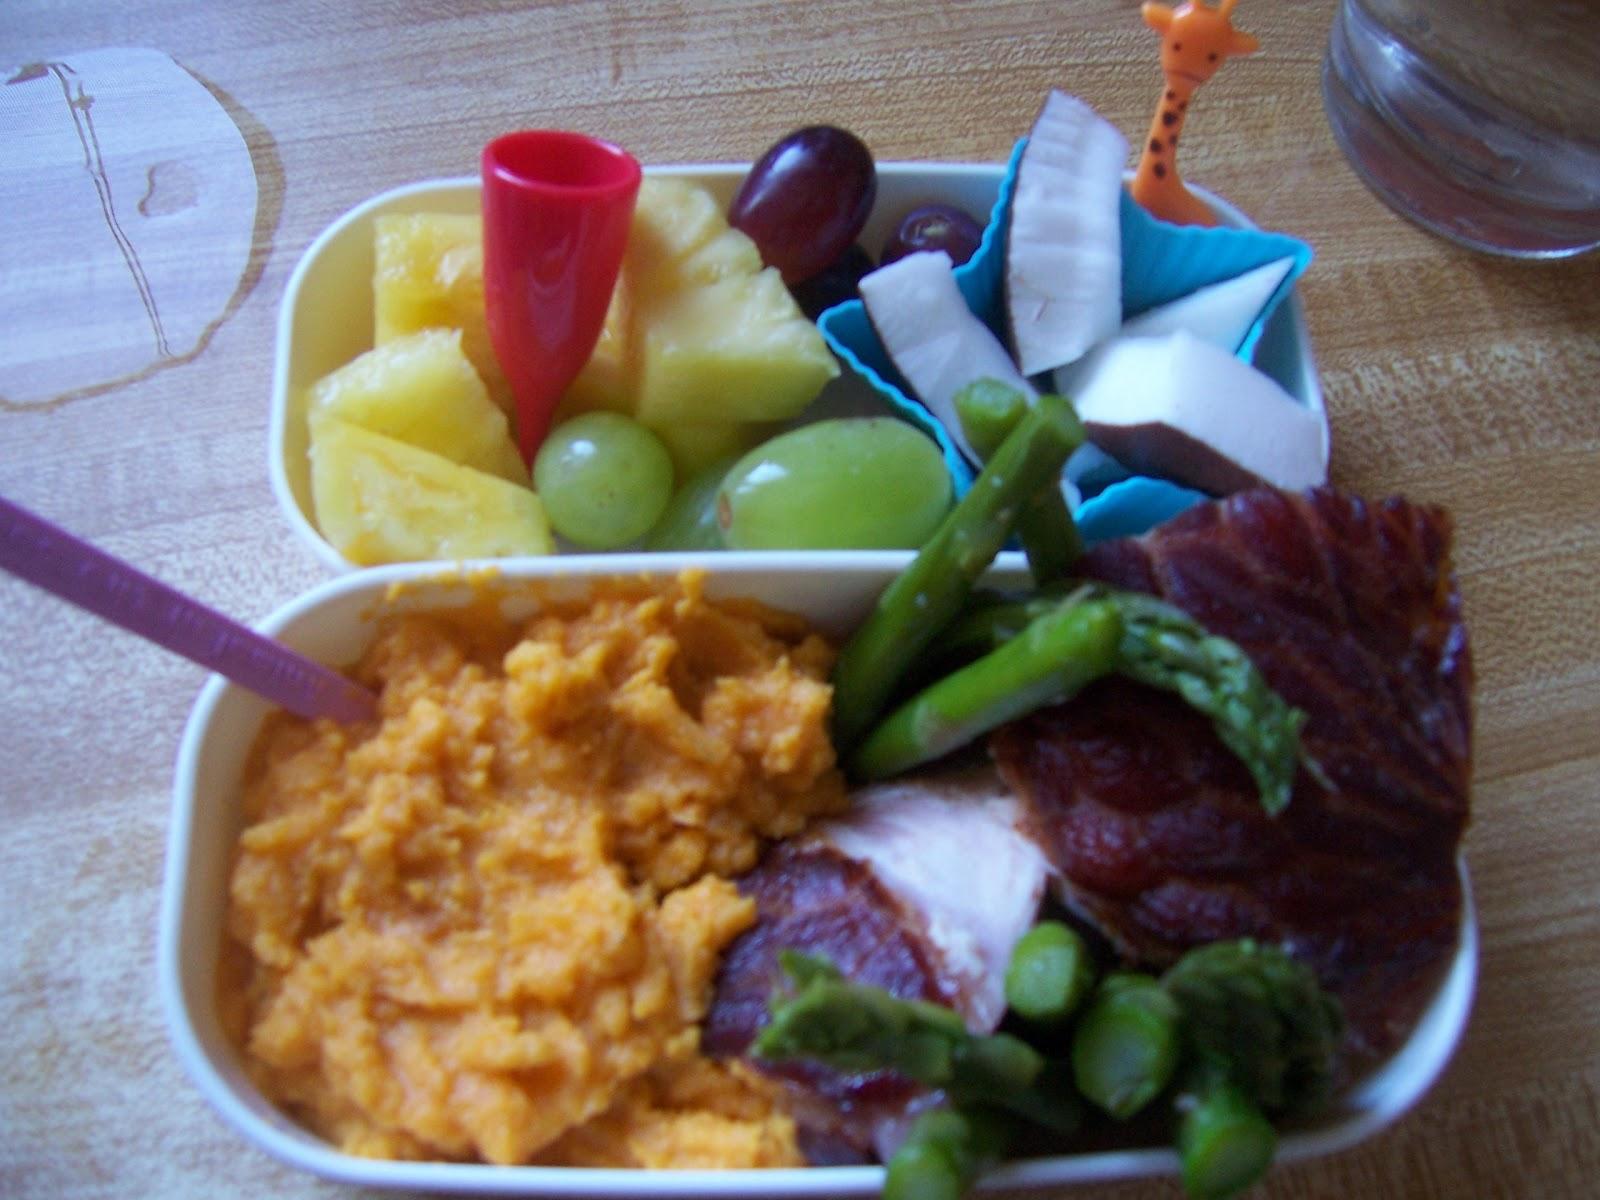 lunch kåt